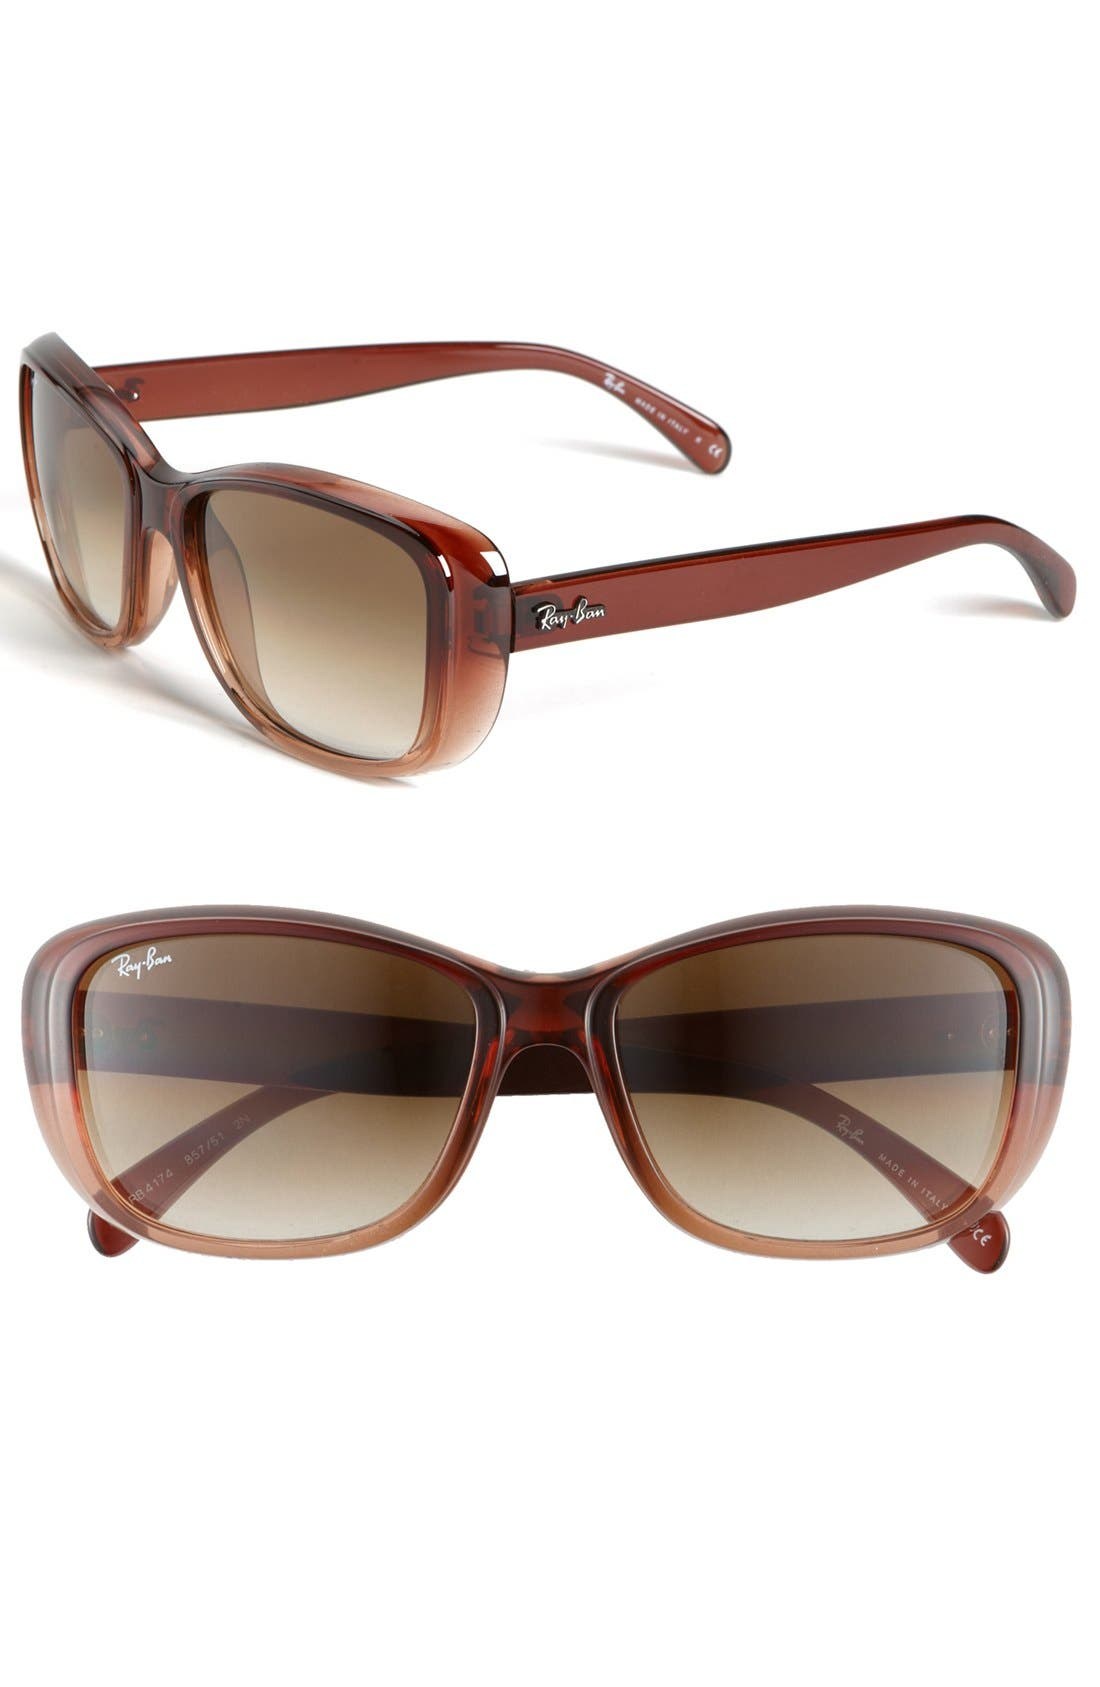 Main Image - Ray-Ban 'Classic' 56mm Sunglasses